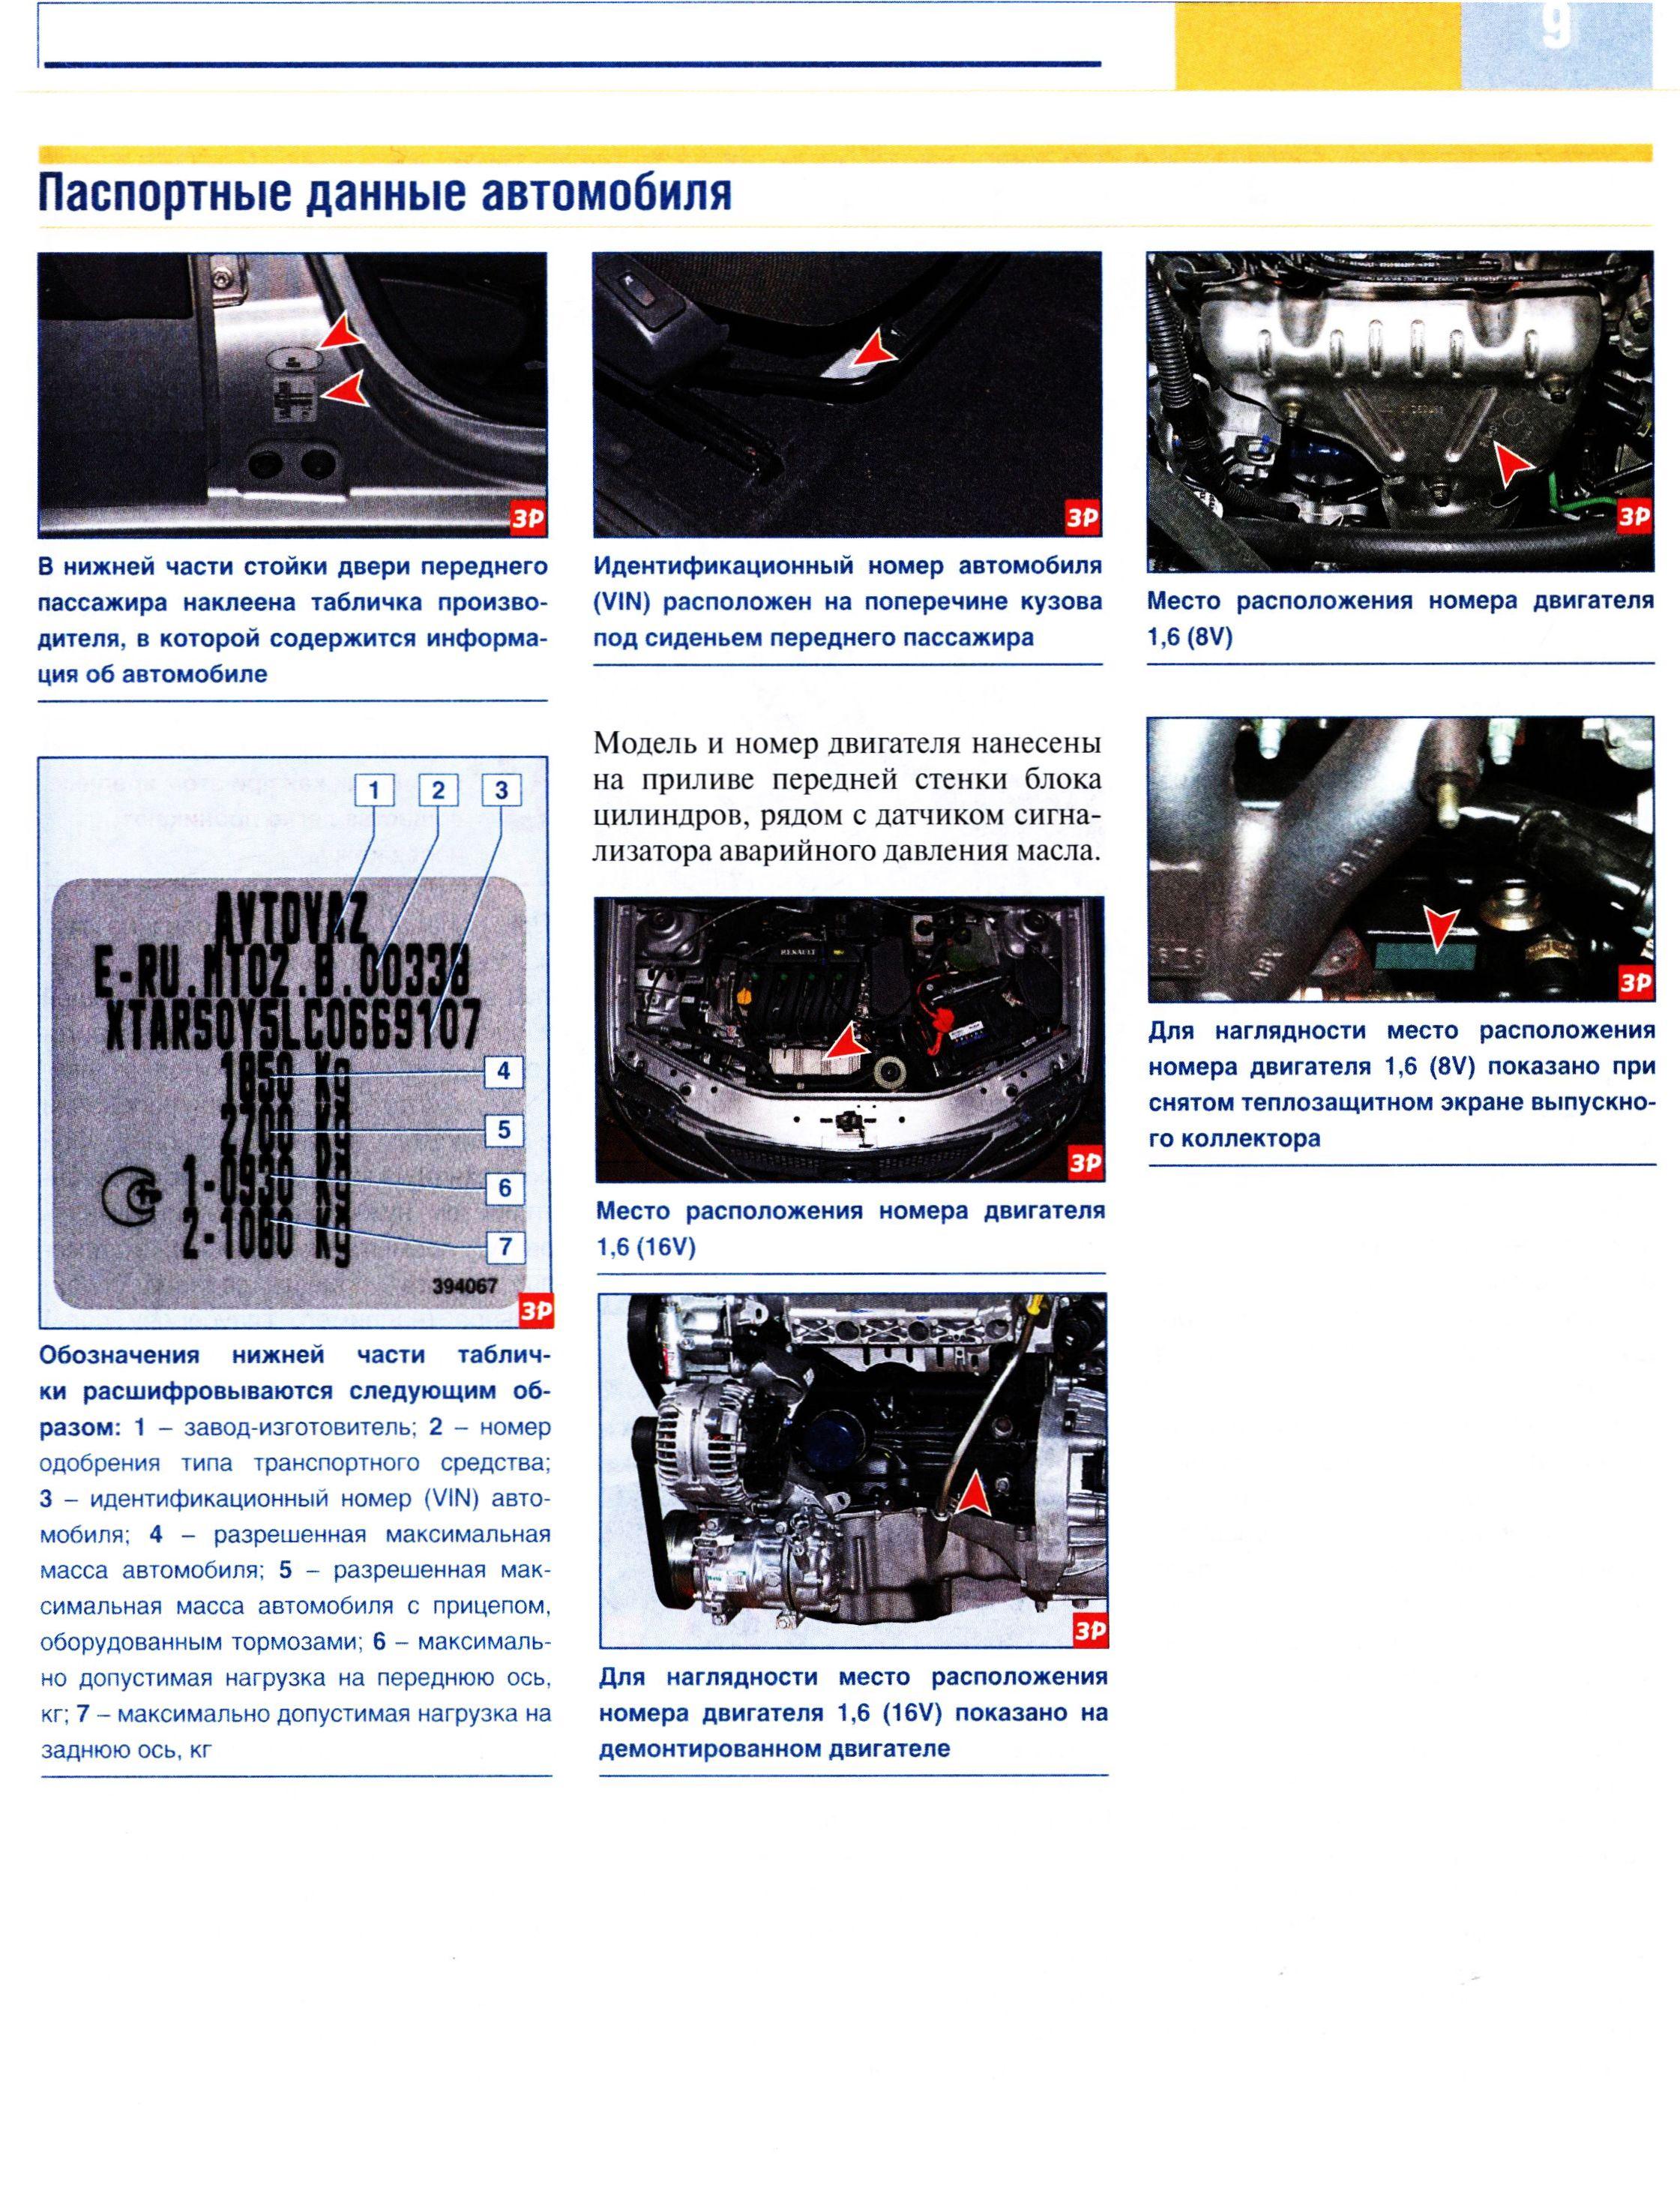 инструкция по эксплуатации лада ларгус pdf